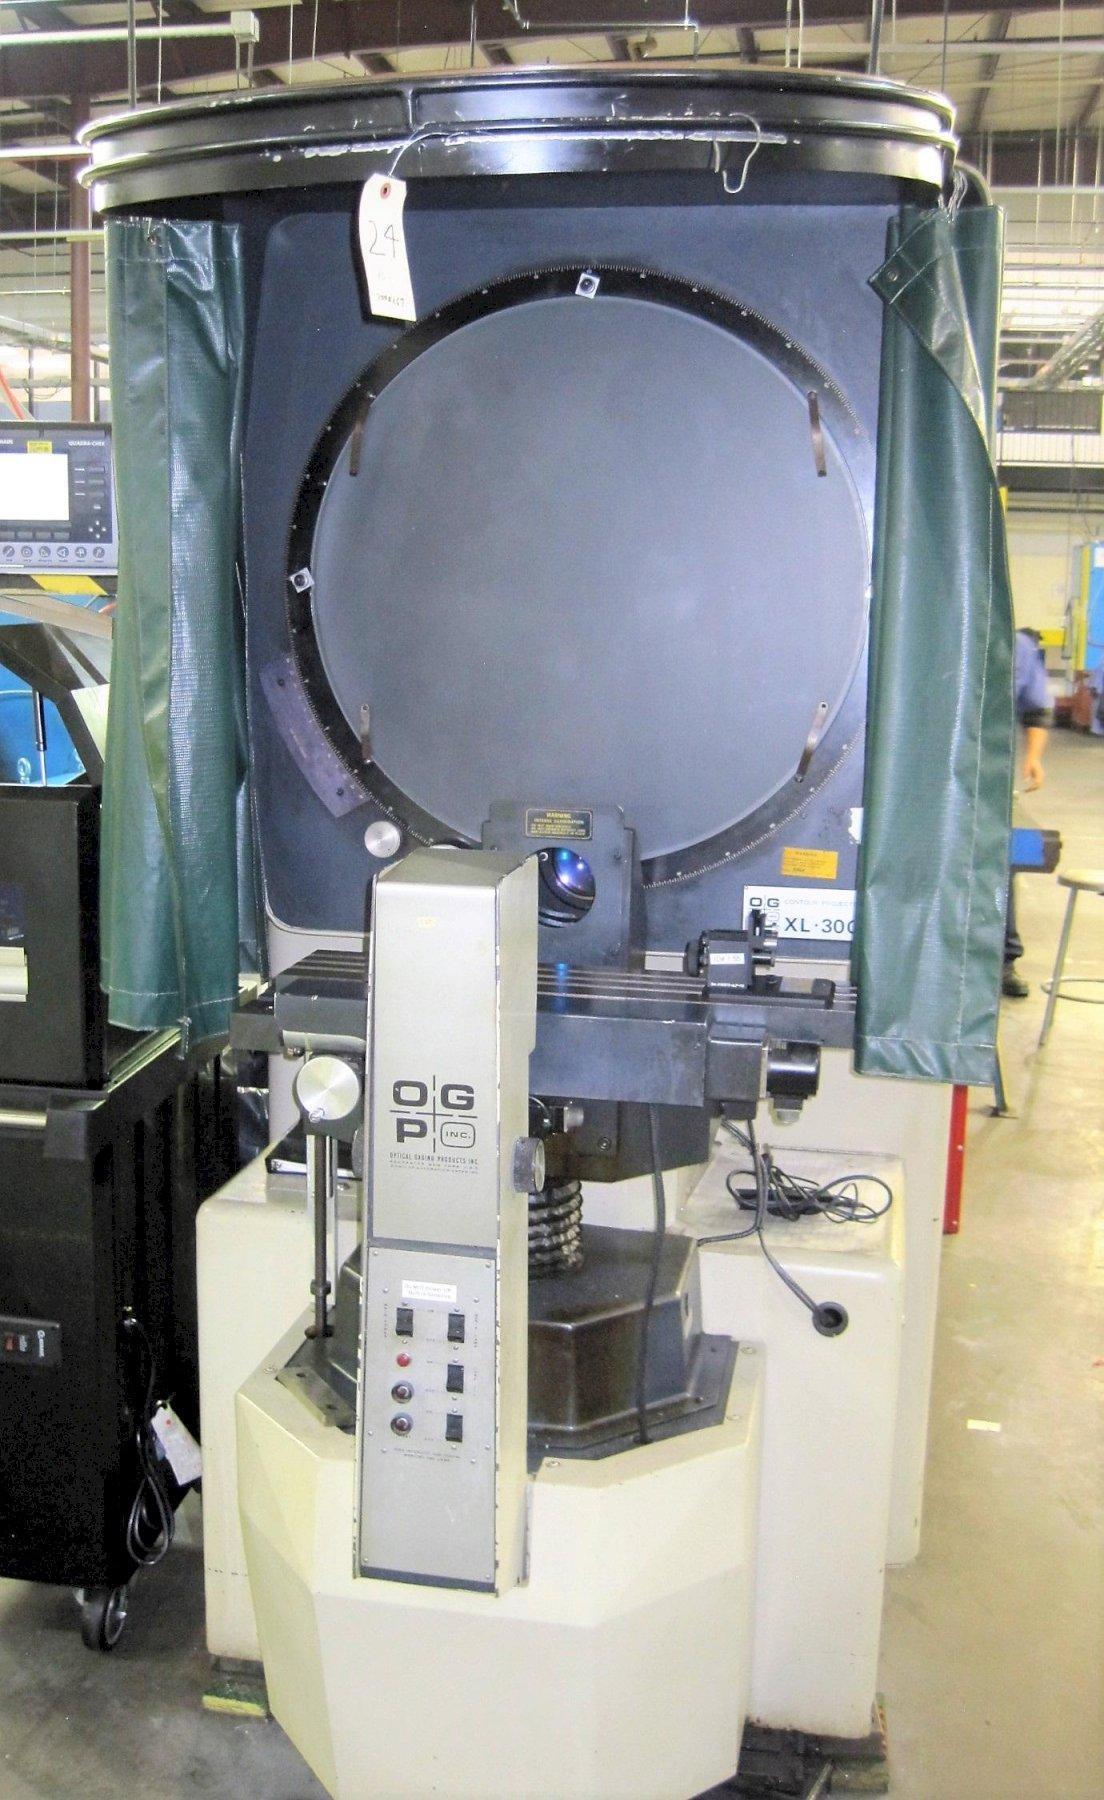 OGP Xl-30 Optical Comparator